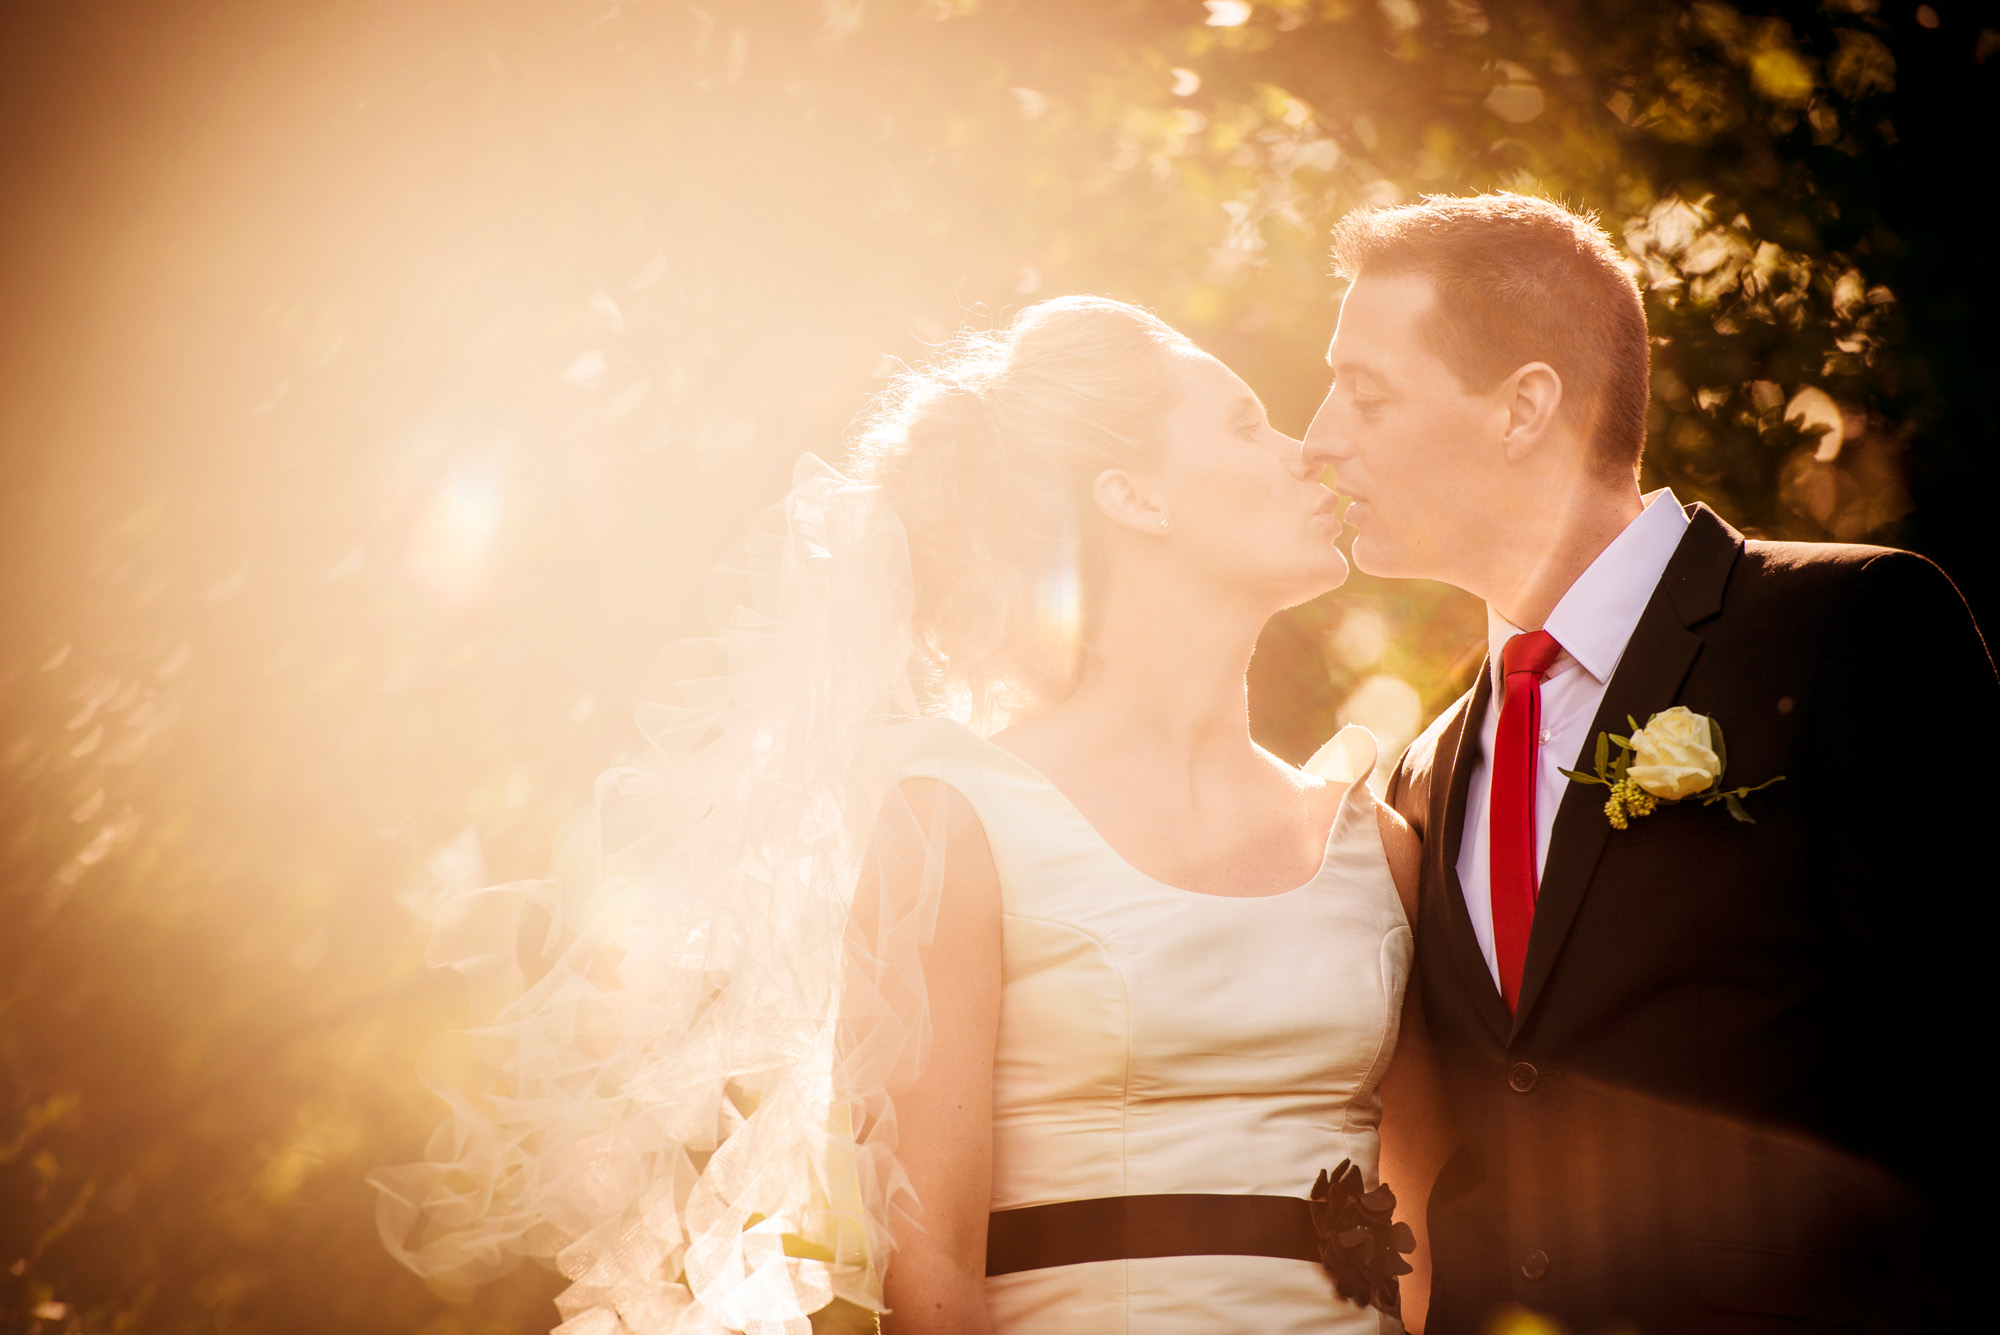 Bryllupsfotografering i naturen